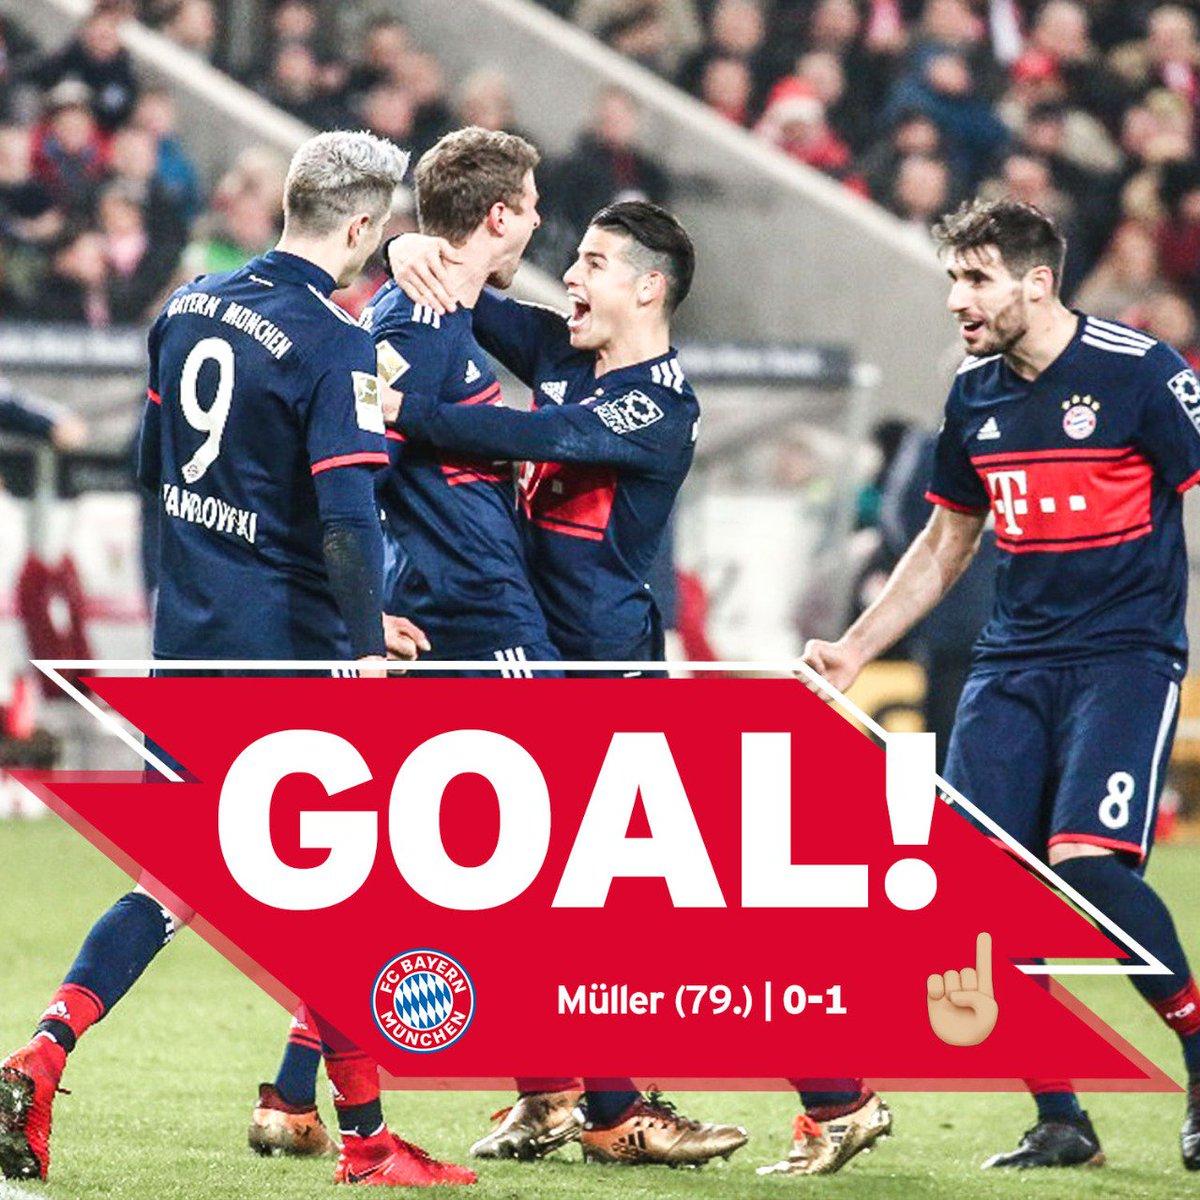 Chấm điểm trận Stuttgart 0-1 Bayern Munich